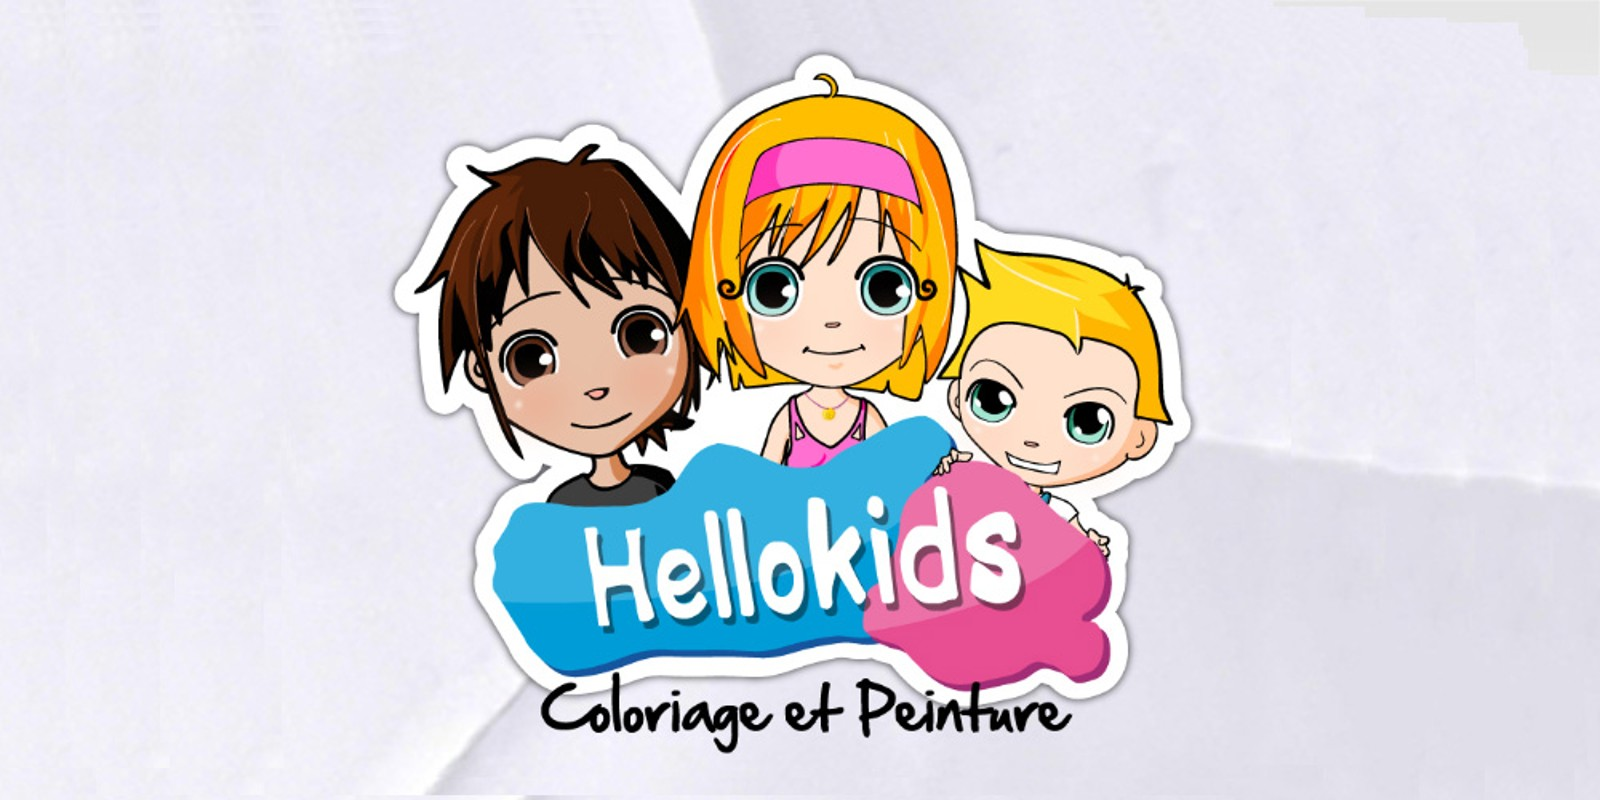 Hellokids Vol 1 Coloriage Et Peinture Nintendo Dsiware